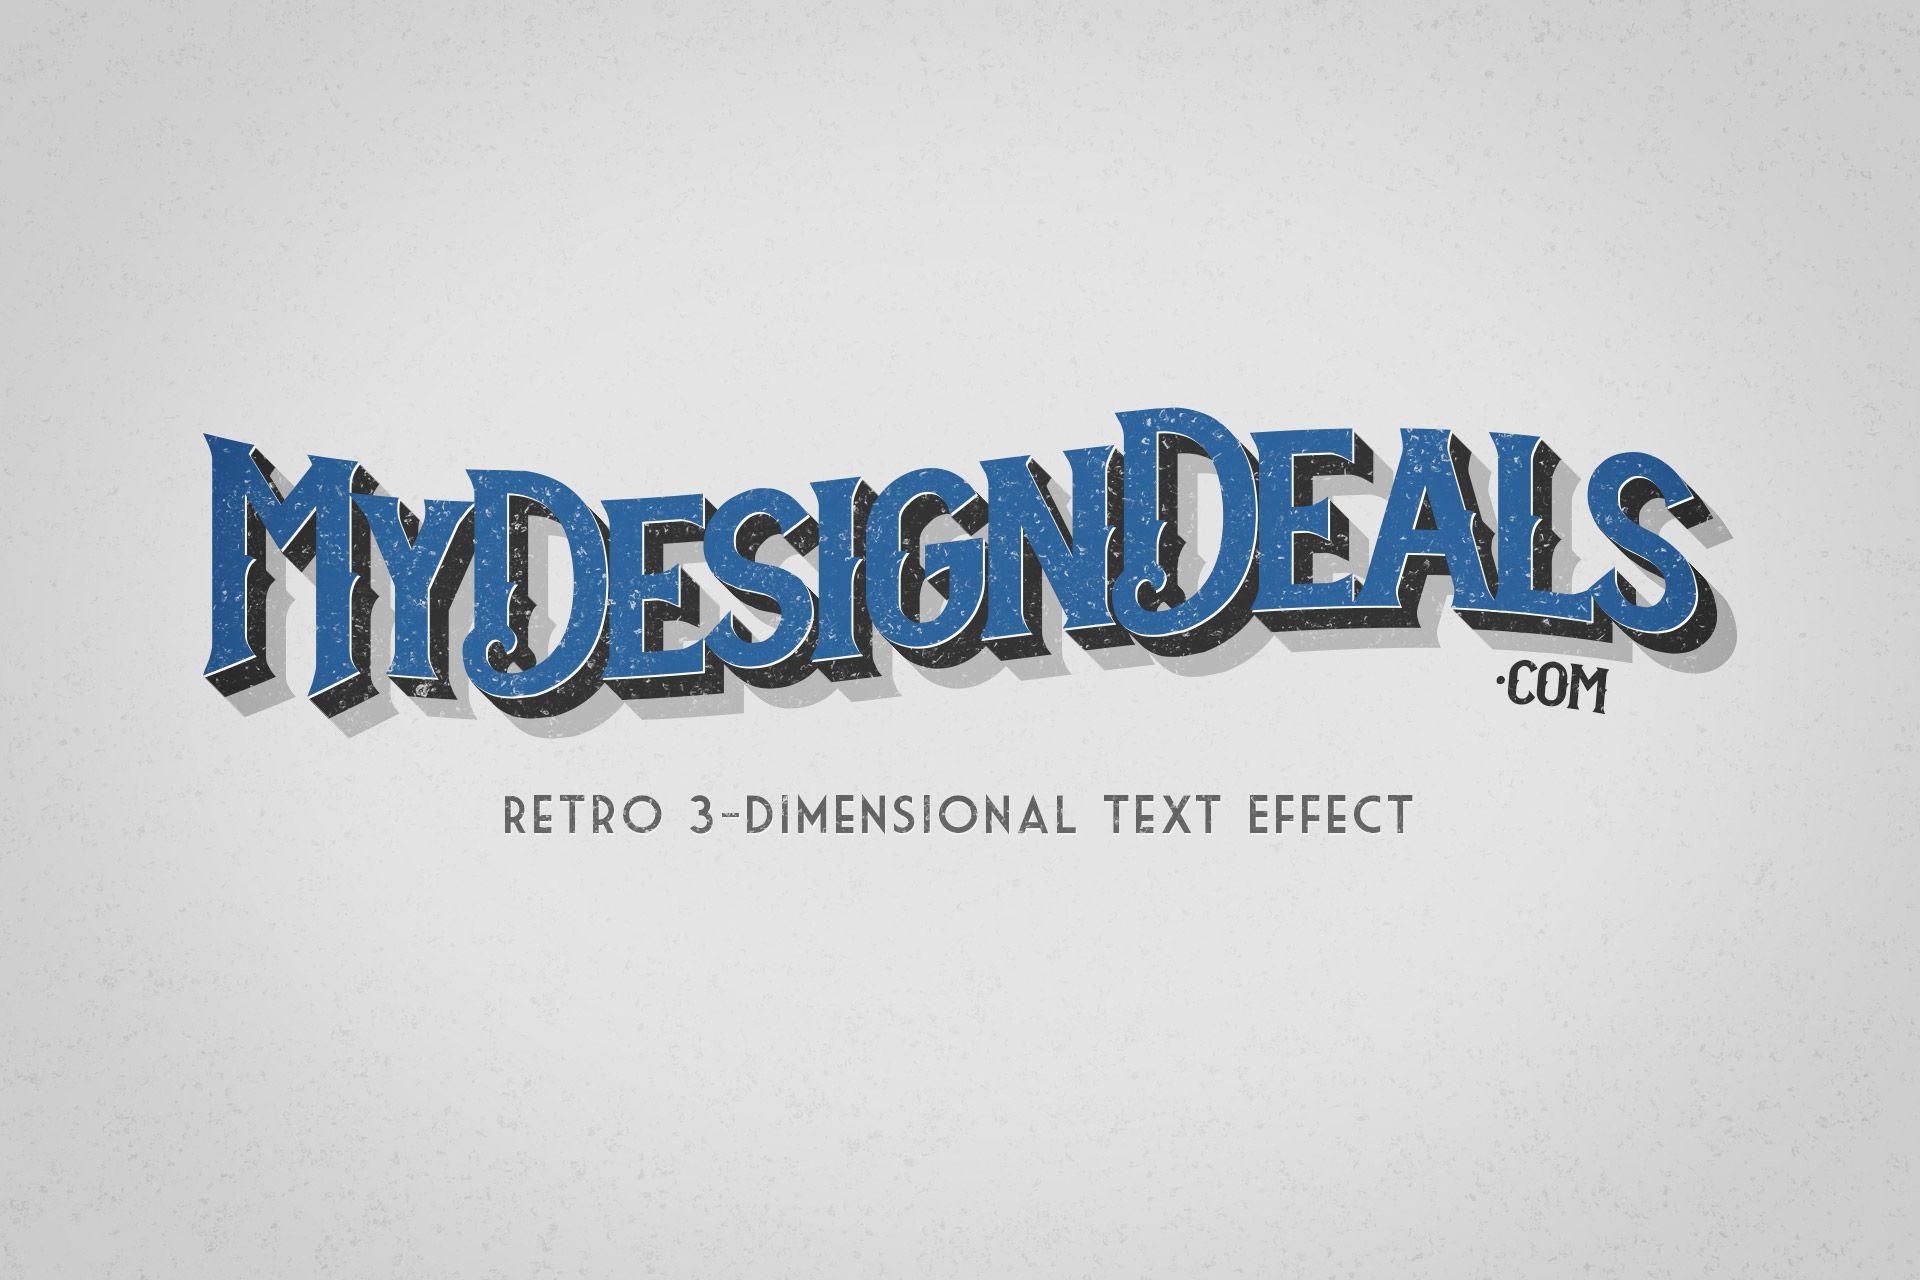 Retro 3 dimensional text effect photoshop tutorial from my design retro 3 dimensional text effect photoshop tutorial from my design deals baditri Images